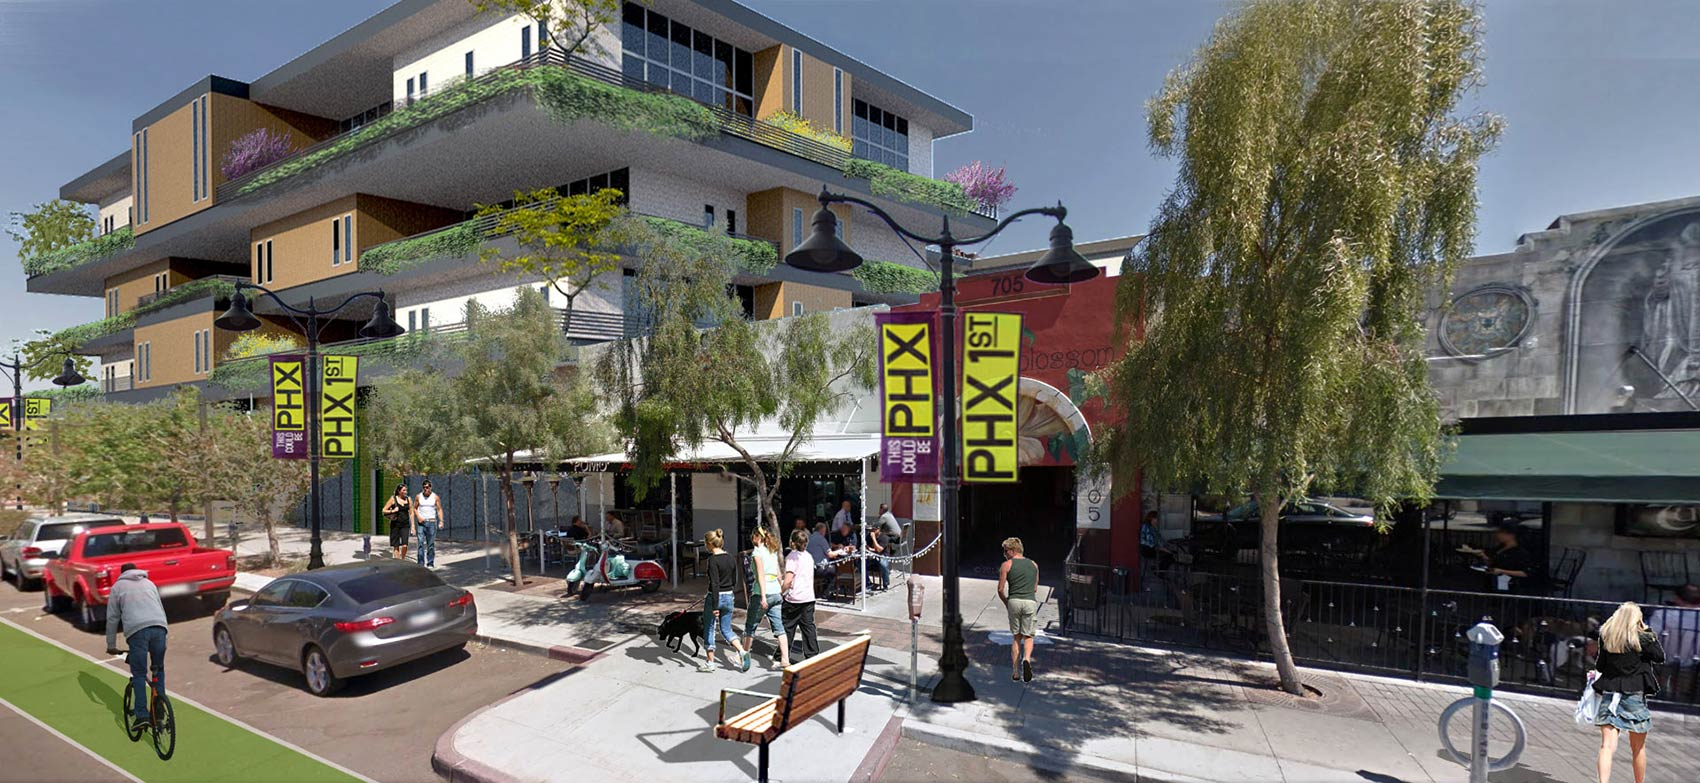 Phoenix 1st Street Downtown